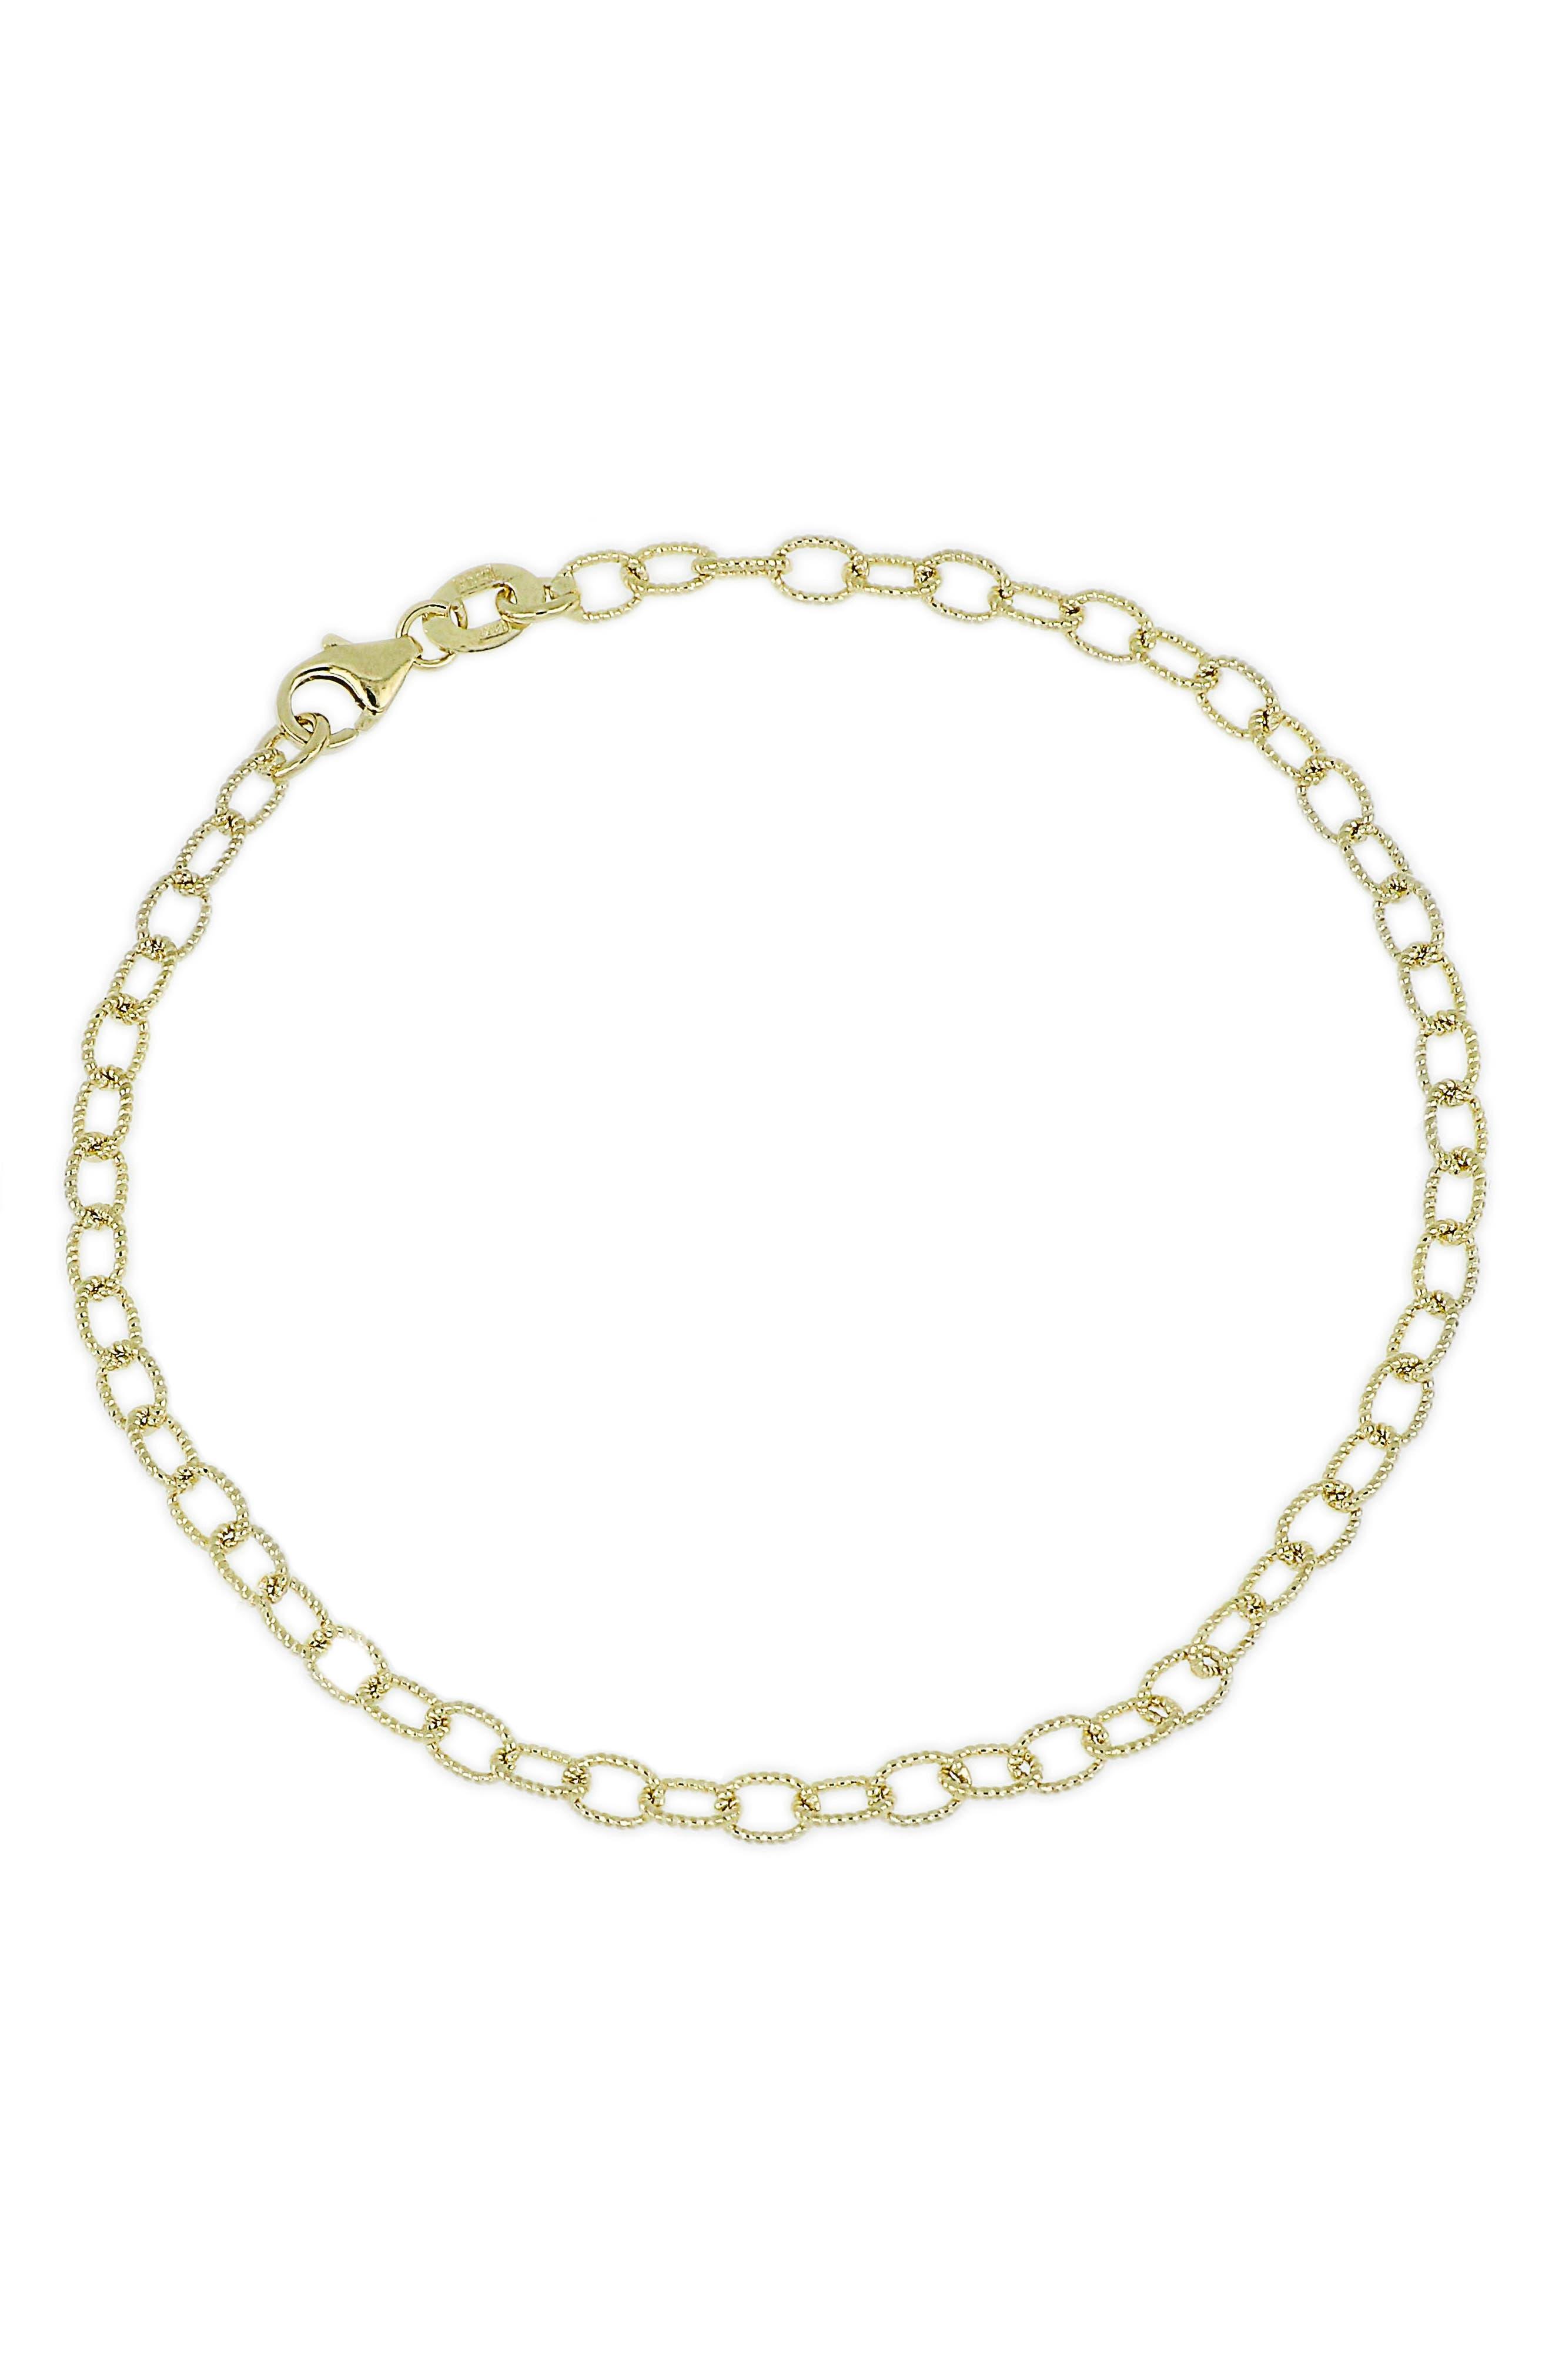 14k Gold Link Charm Bracelet,                             Main thumbnail 1, color,                             710